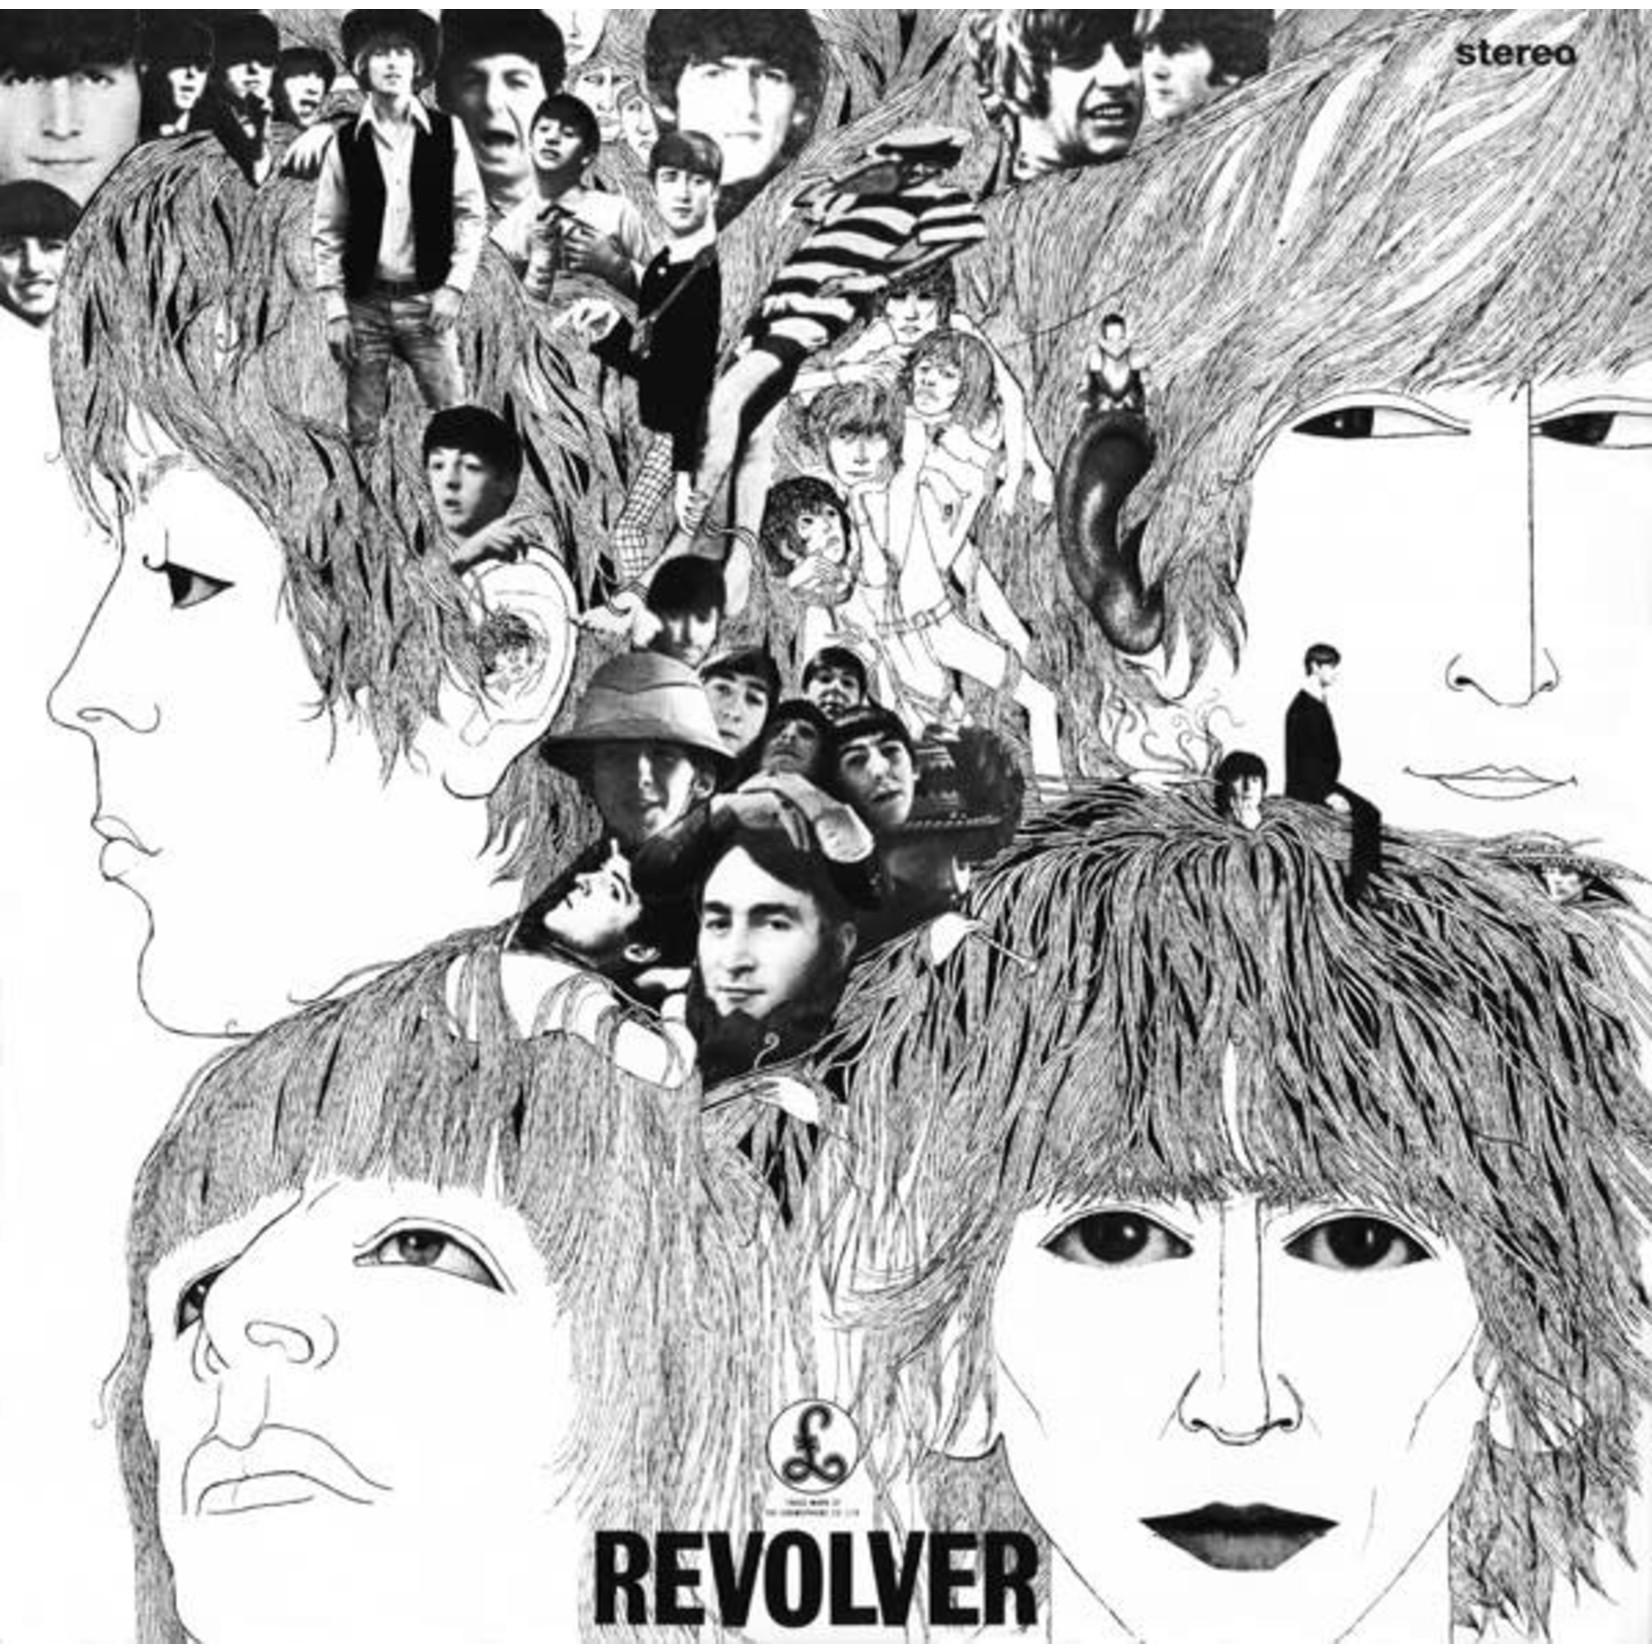 [New] Beatles: Revolver (stereo mix)